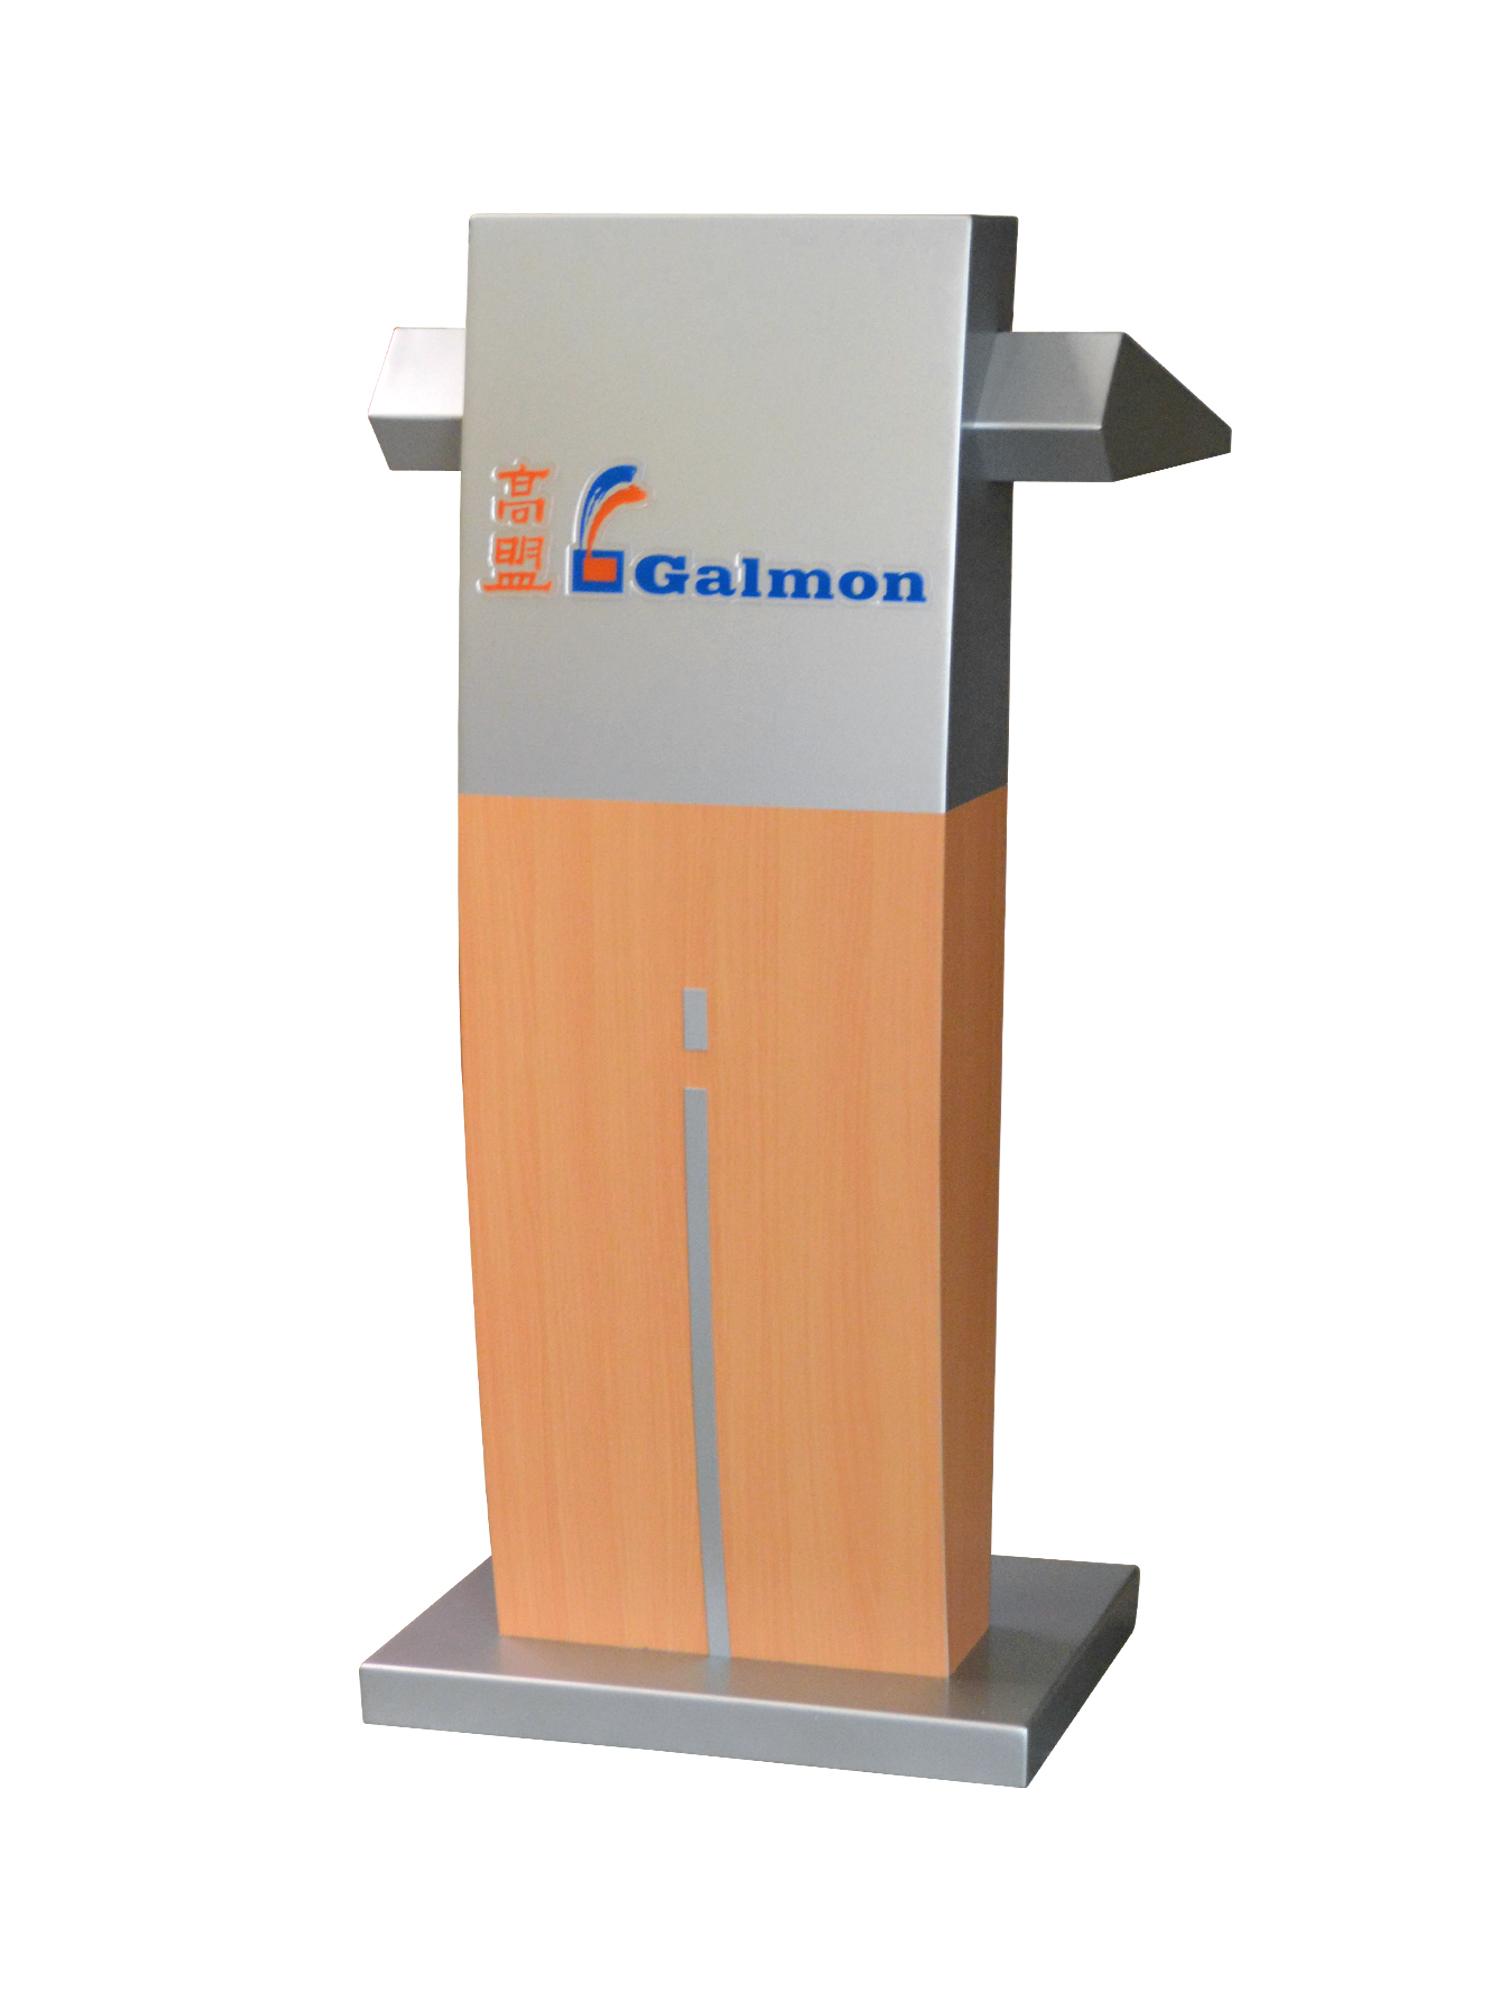 Galmon (S) Pte. Ltd.